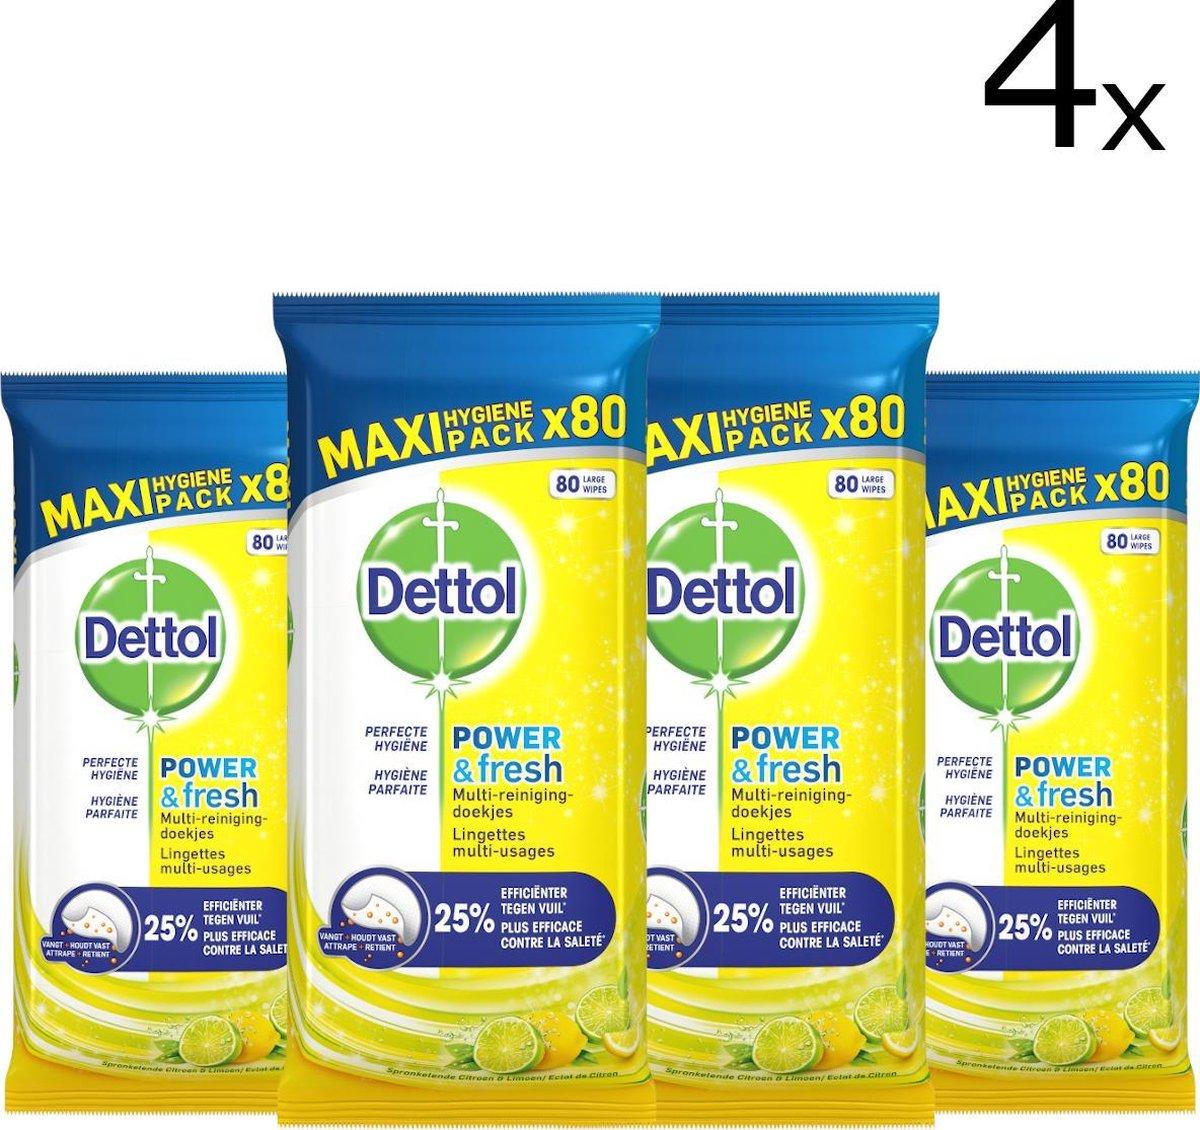 Dettol Power & Fresh - Schoonmaakdoekjes - Citrus - 4 x 80 doekjes